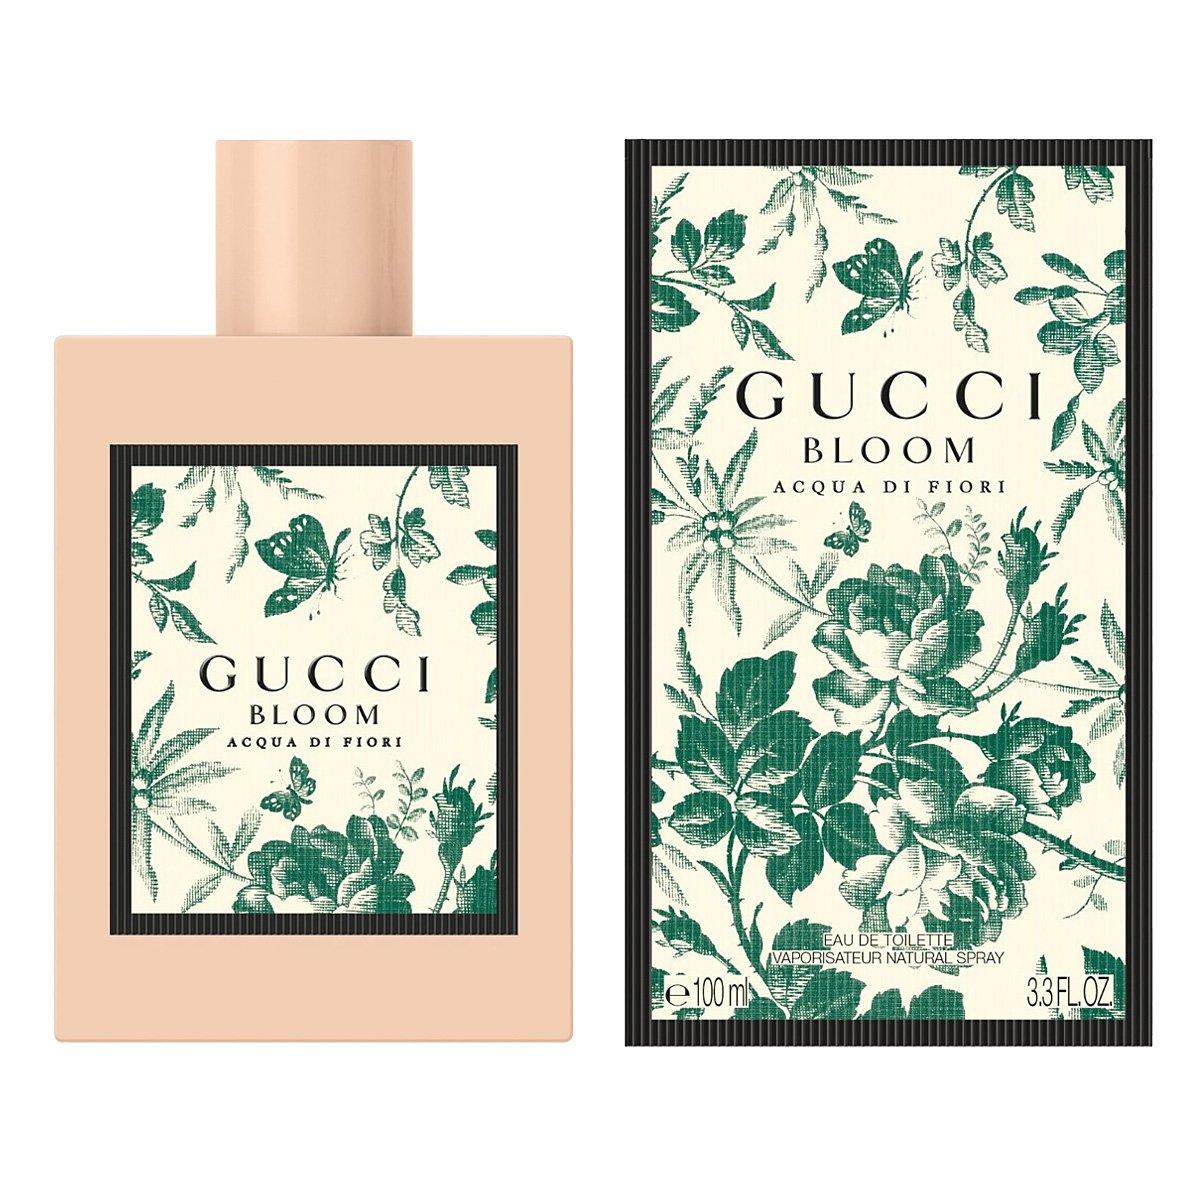 Gucci Bloom Acqua Di Fiori купить в минске и рб